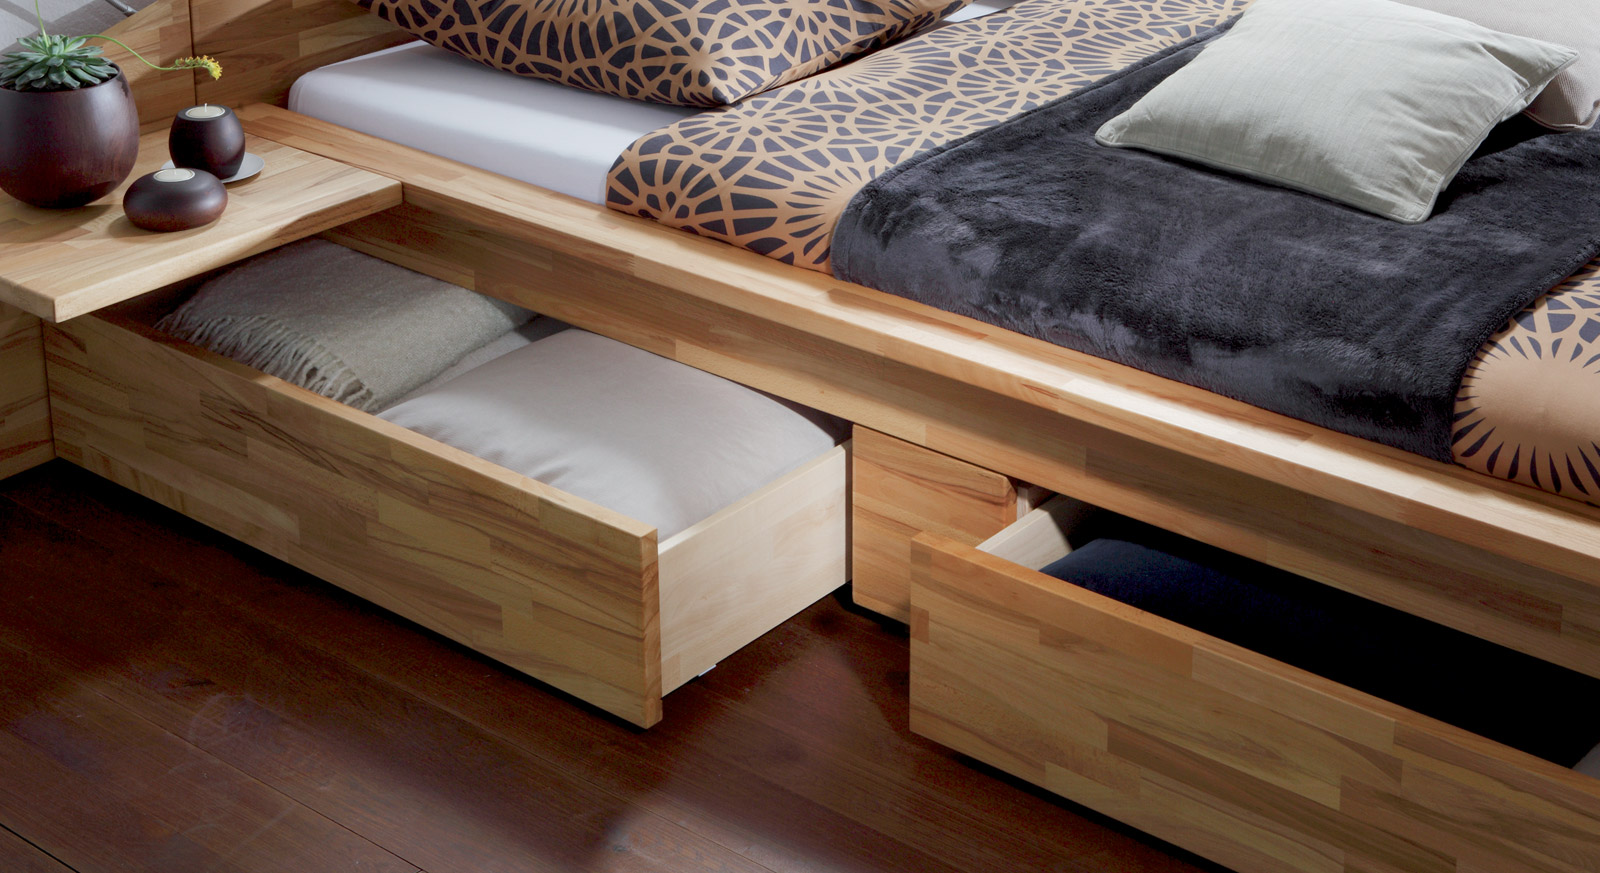 betten mit schubladen um superpreis pictures to pin on. Black Bedroom Furniture Sets. Home Design Ideas